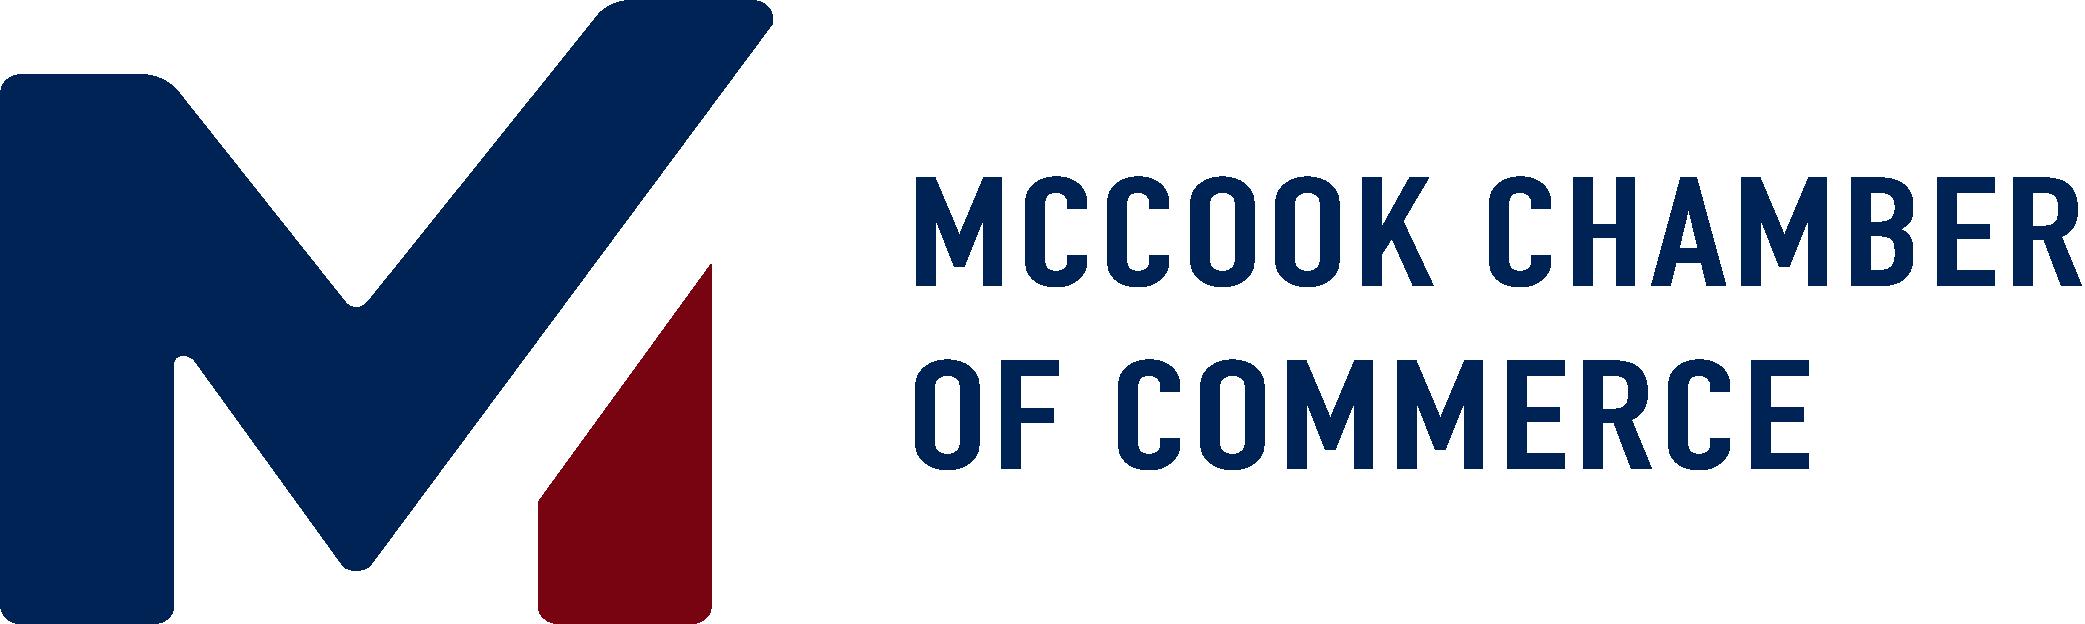 McCook Chamber of Commerce